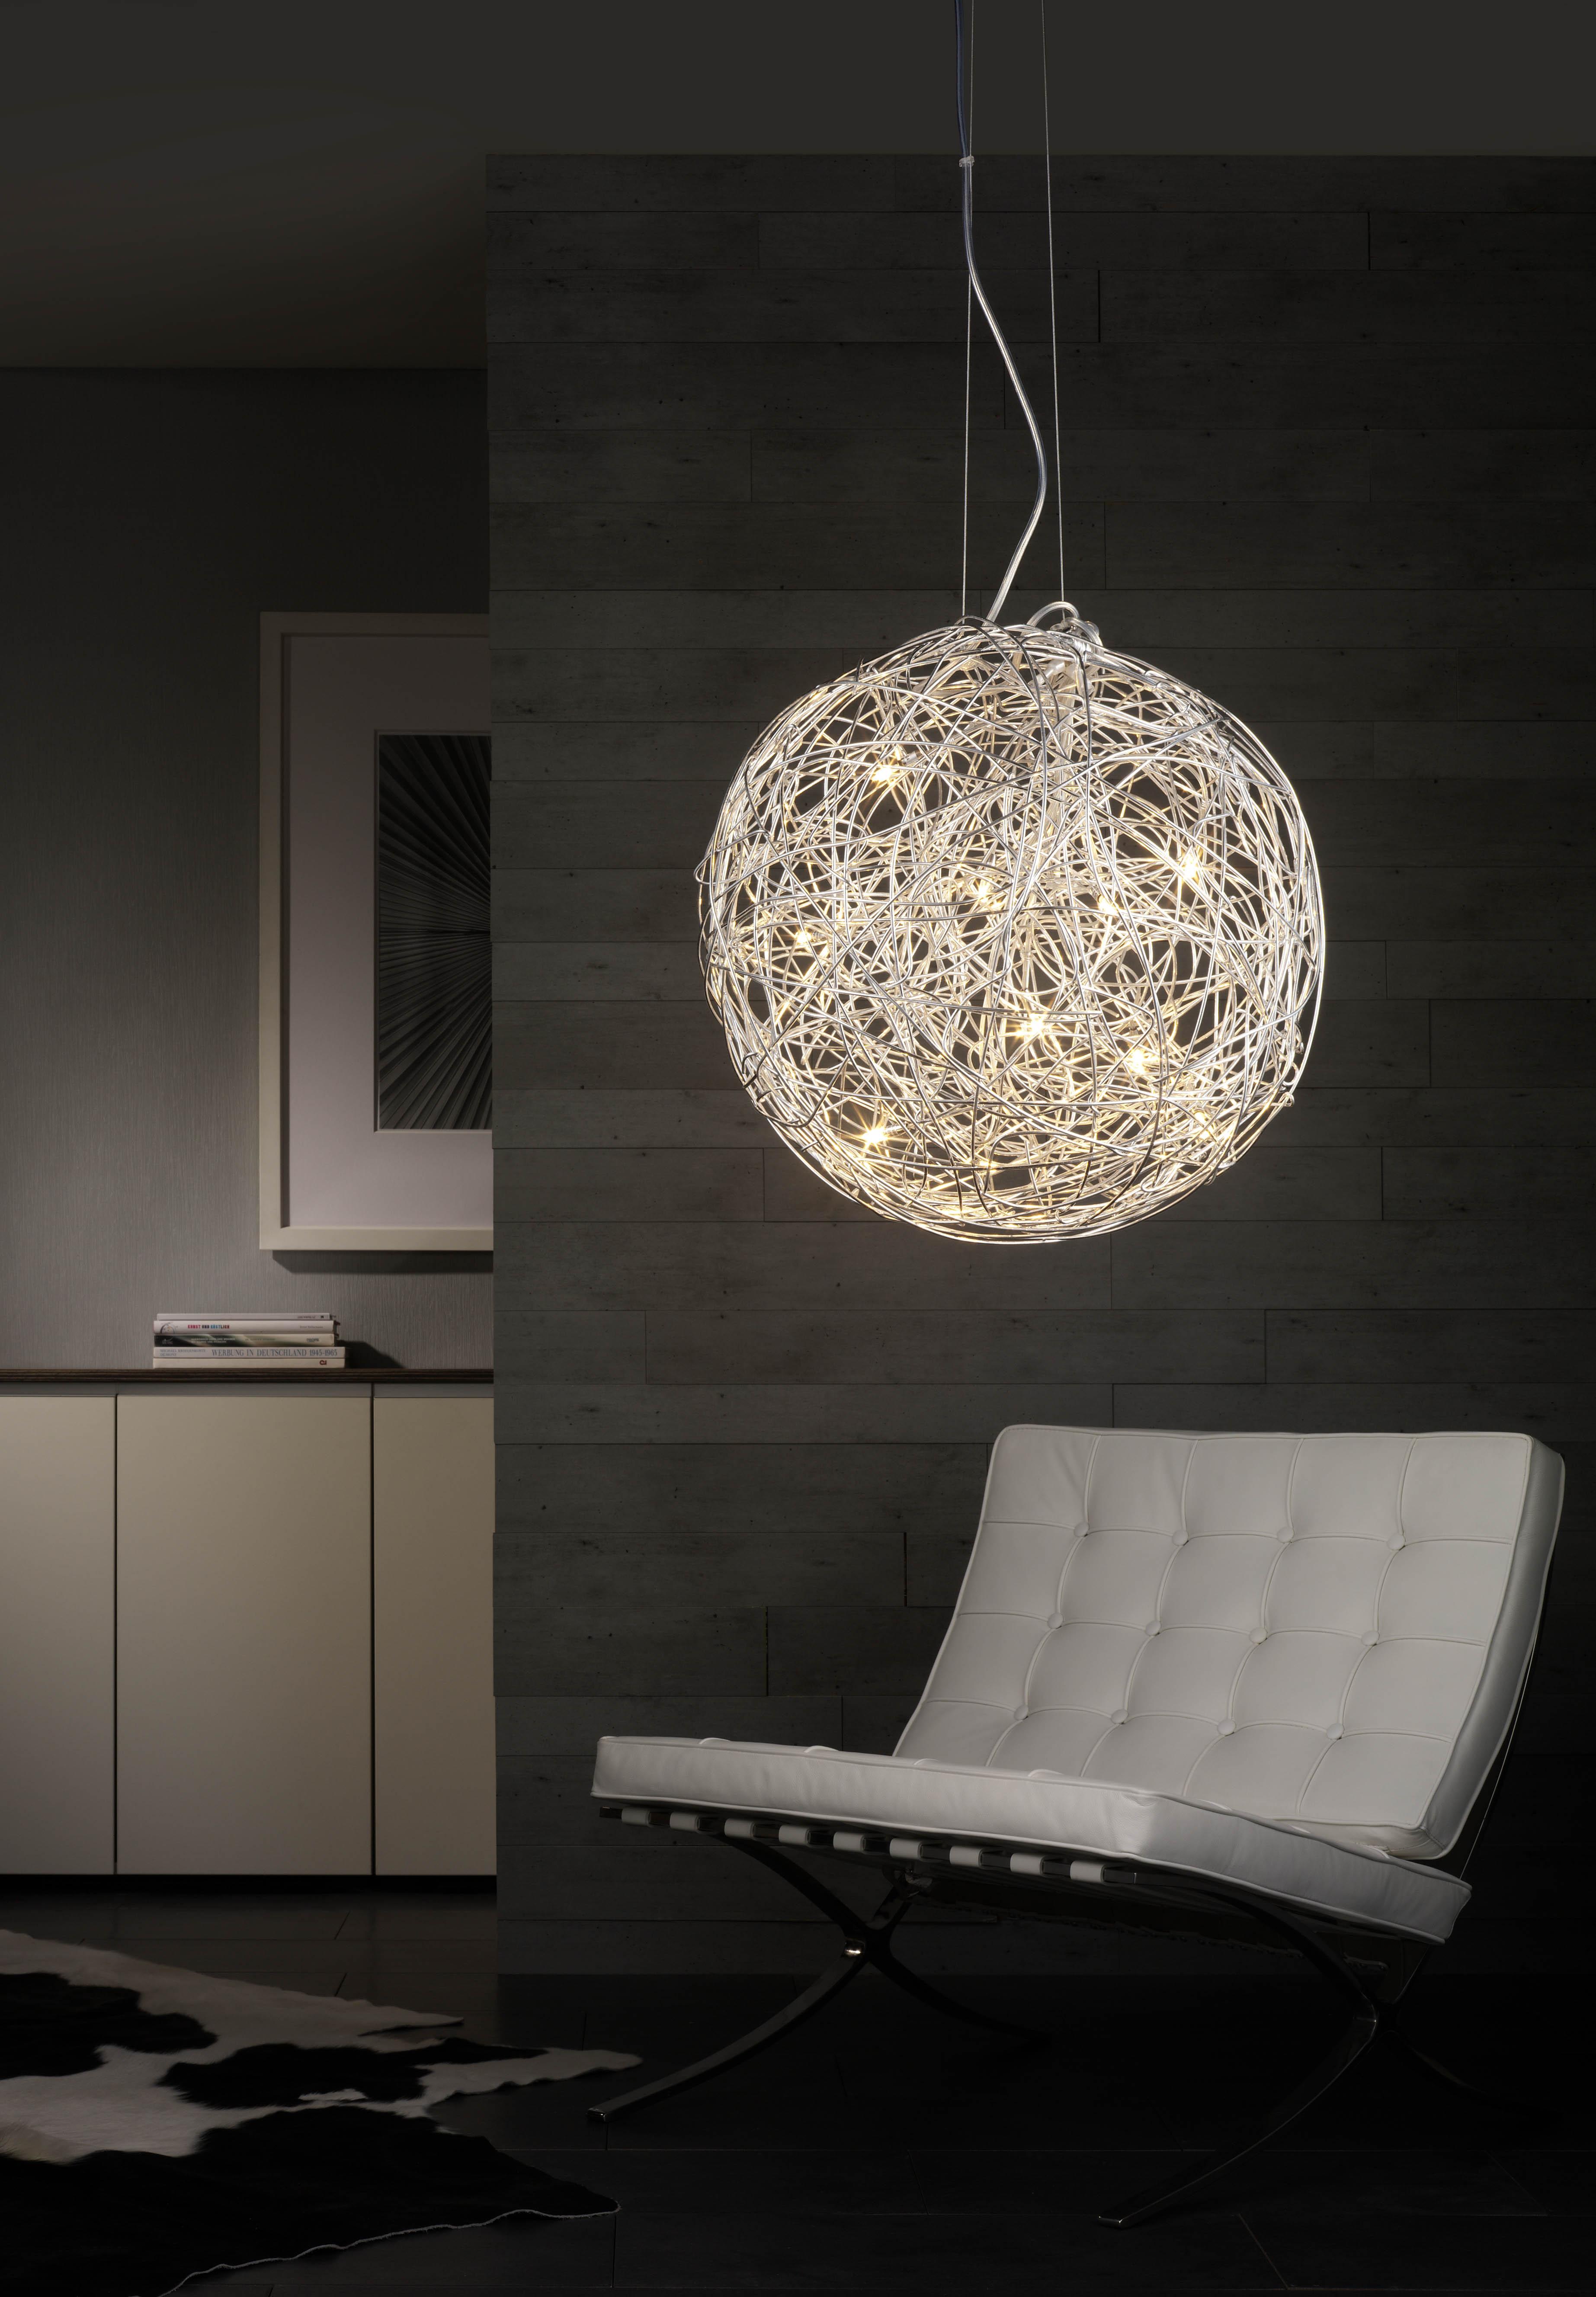 mylight 399607 draht halogen pendelleuchte chrom gl nzend eek c. Black Bedroom Furniture Sets. Home Design Ideas